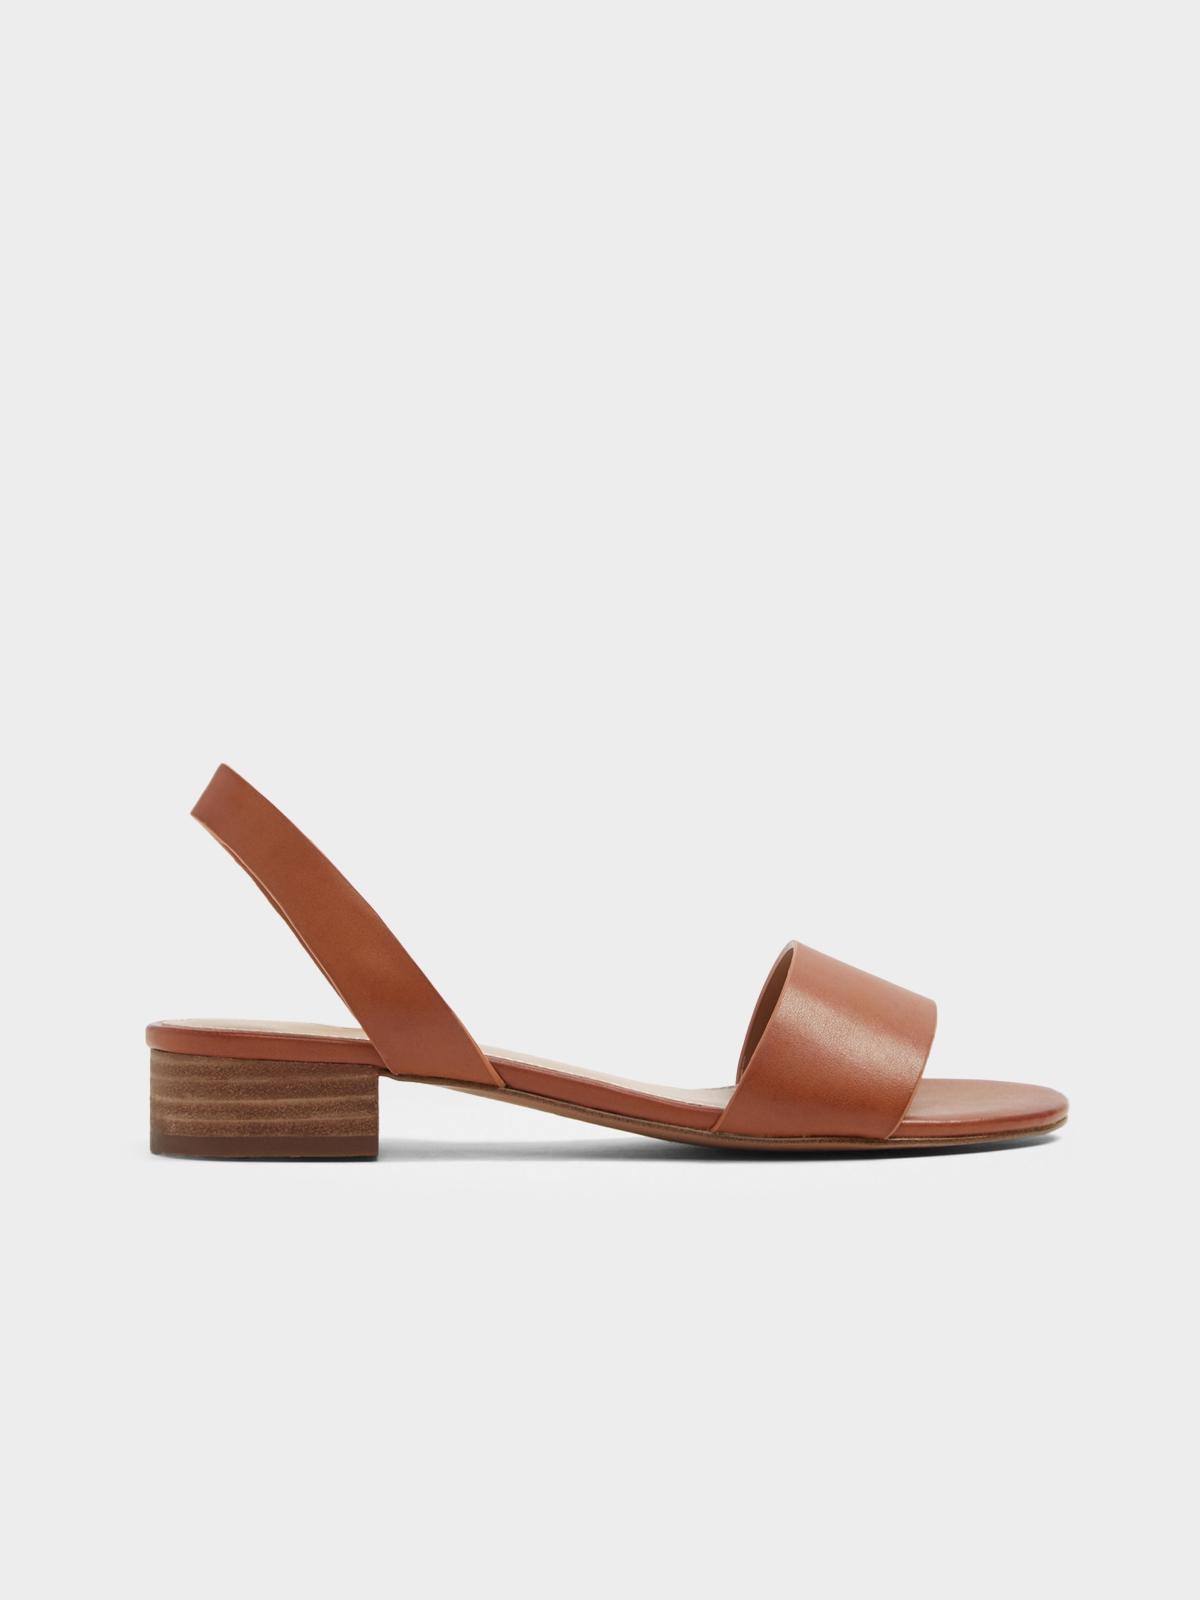 Aldo Candice Sandals Copper